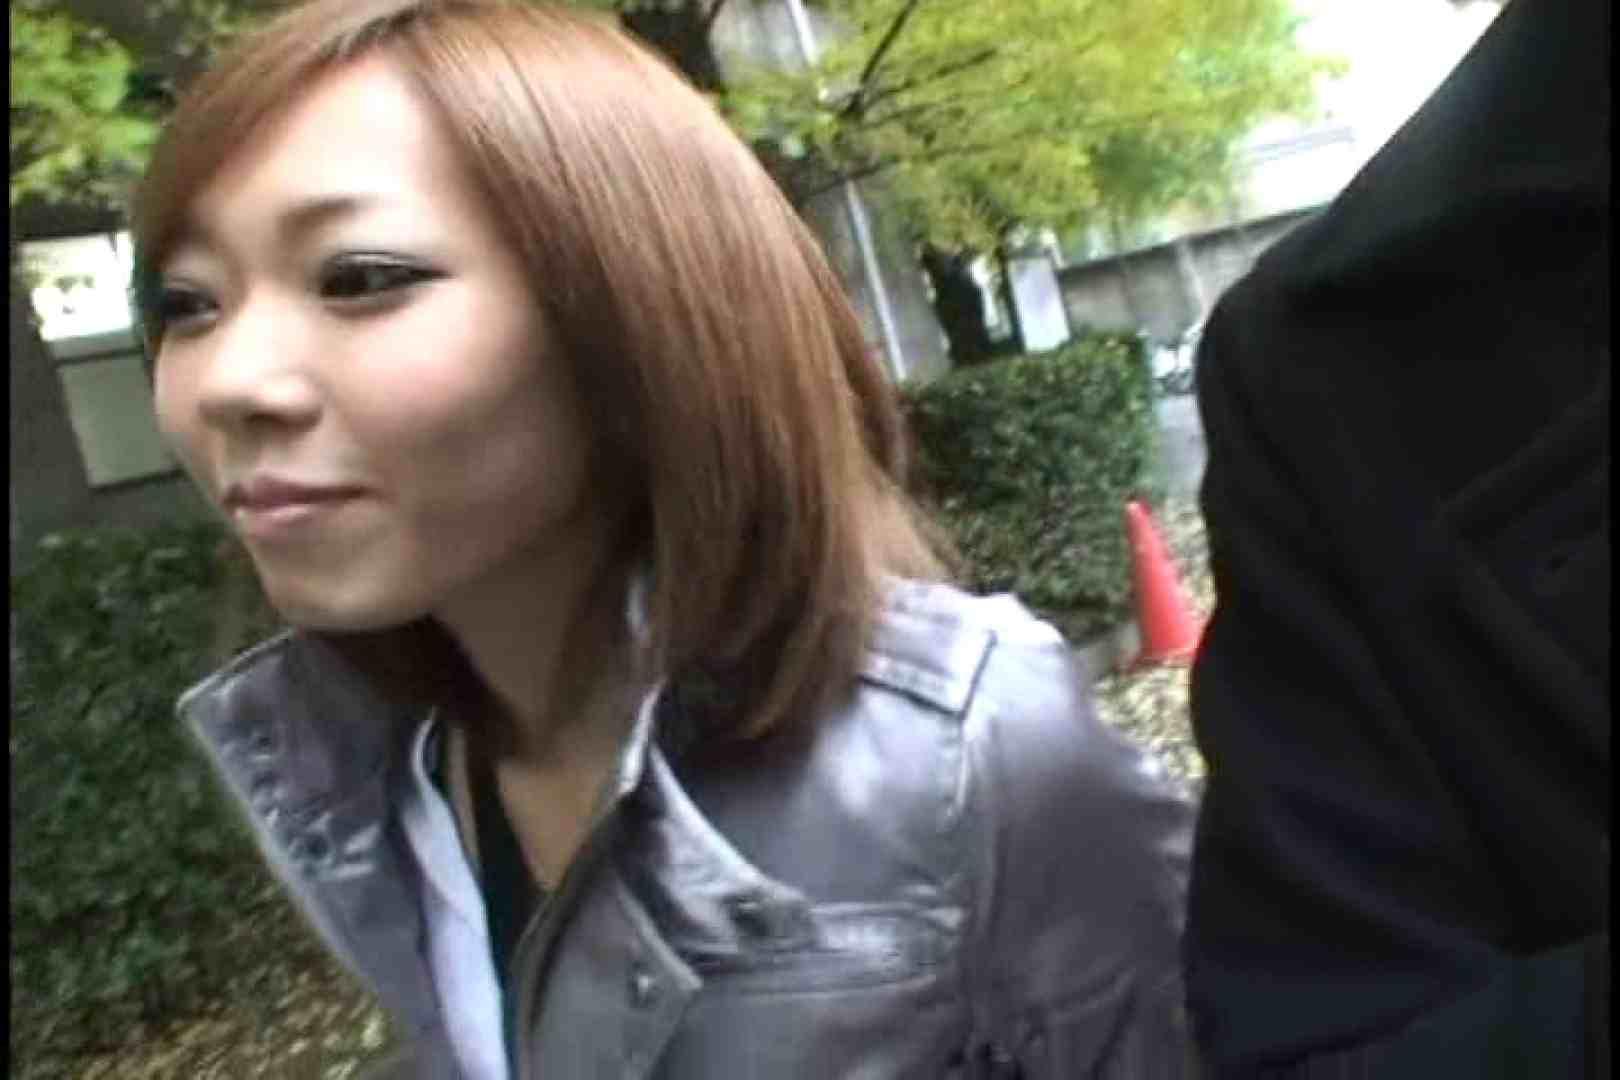 JDハンター全国ツアー vol.036 前編 女子大生のエロ動画  85PIX 14